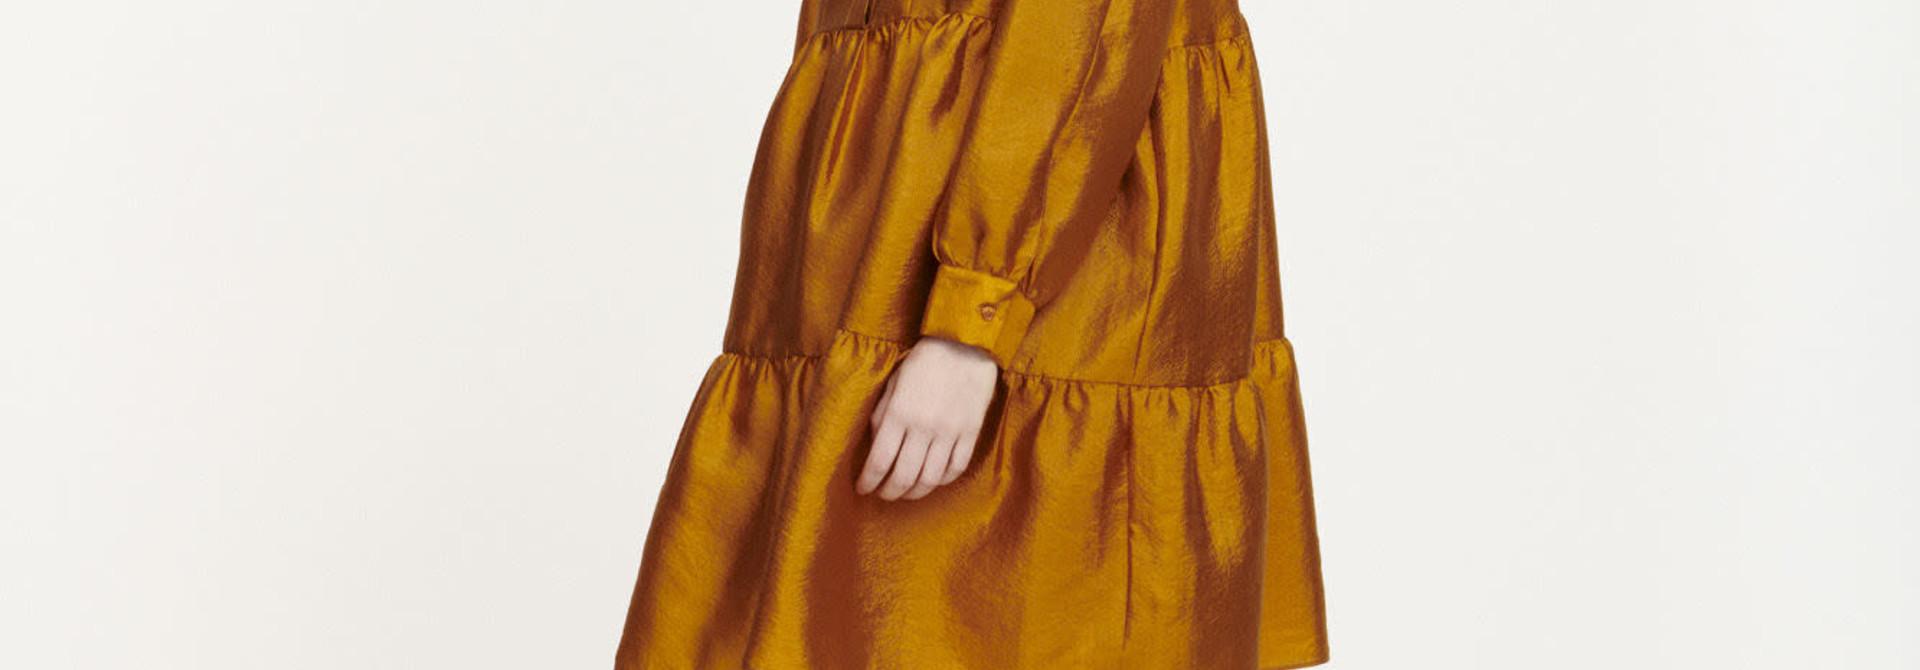 Margo shirt dress Samsoe Samsoe